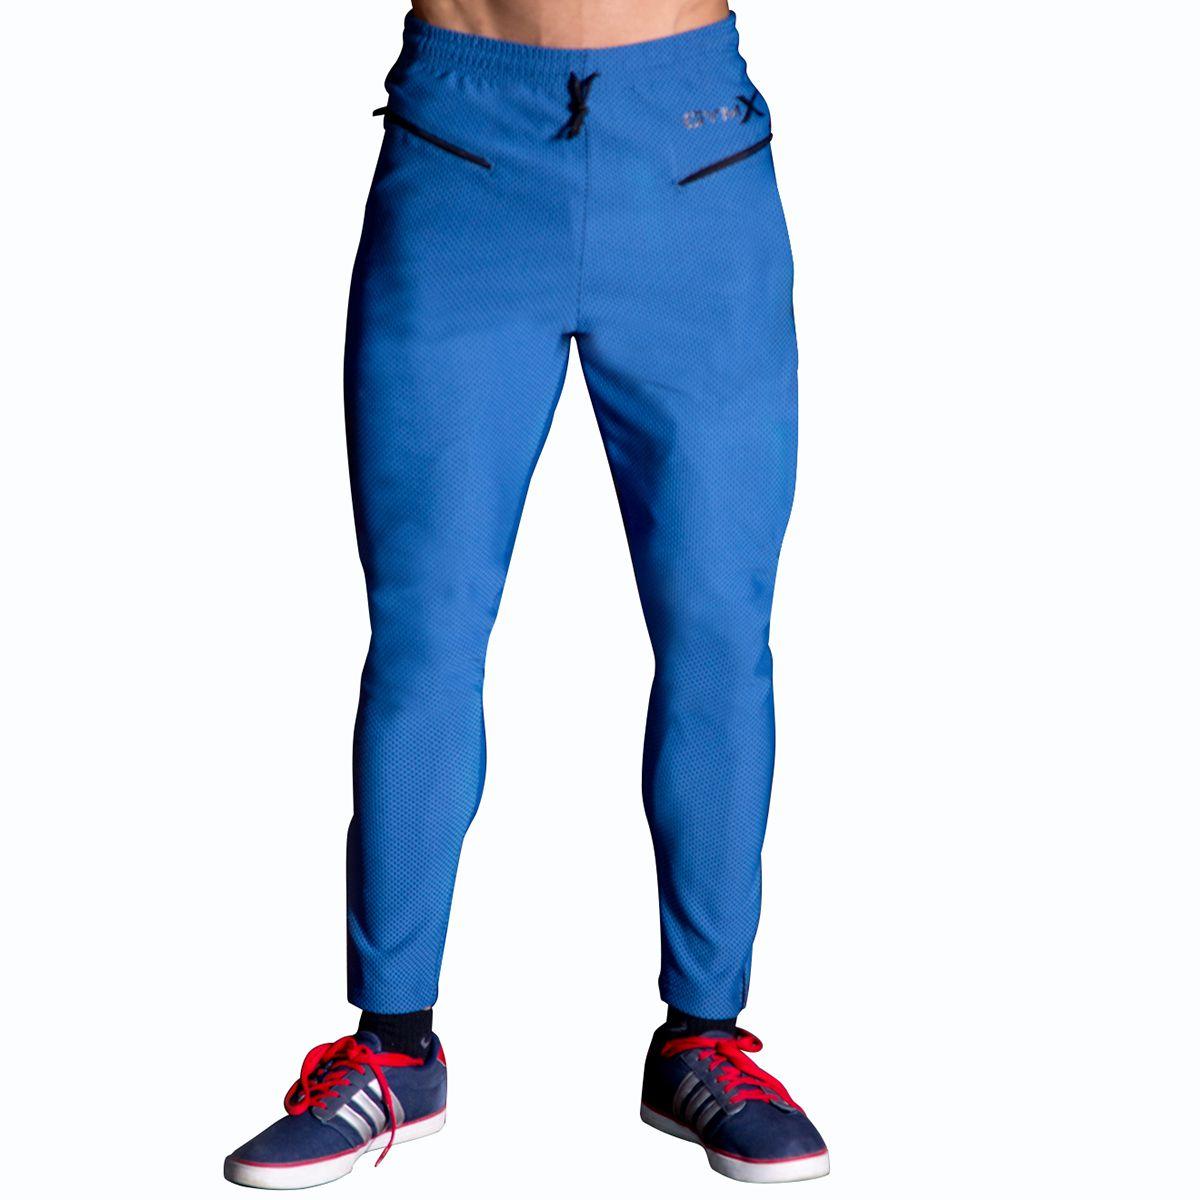 GymX Mens Vanquish Sweatpants- Ocean Blue (Size:Small)